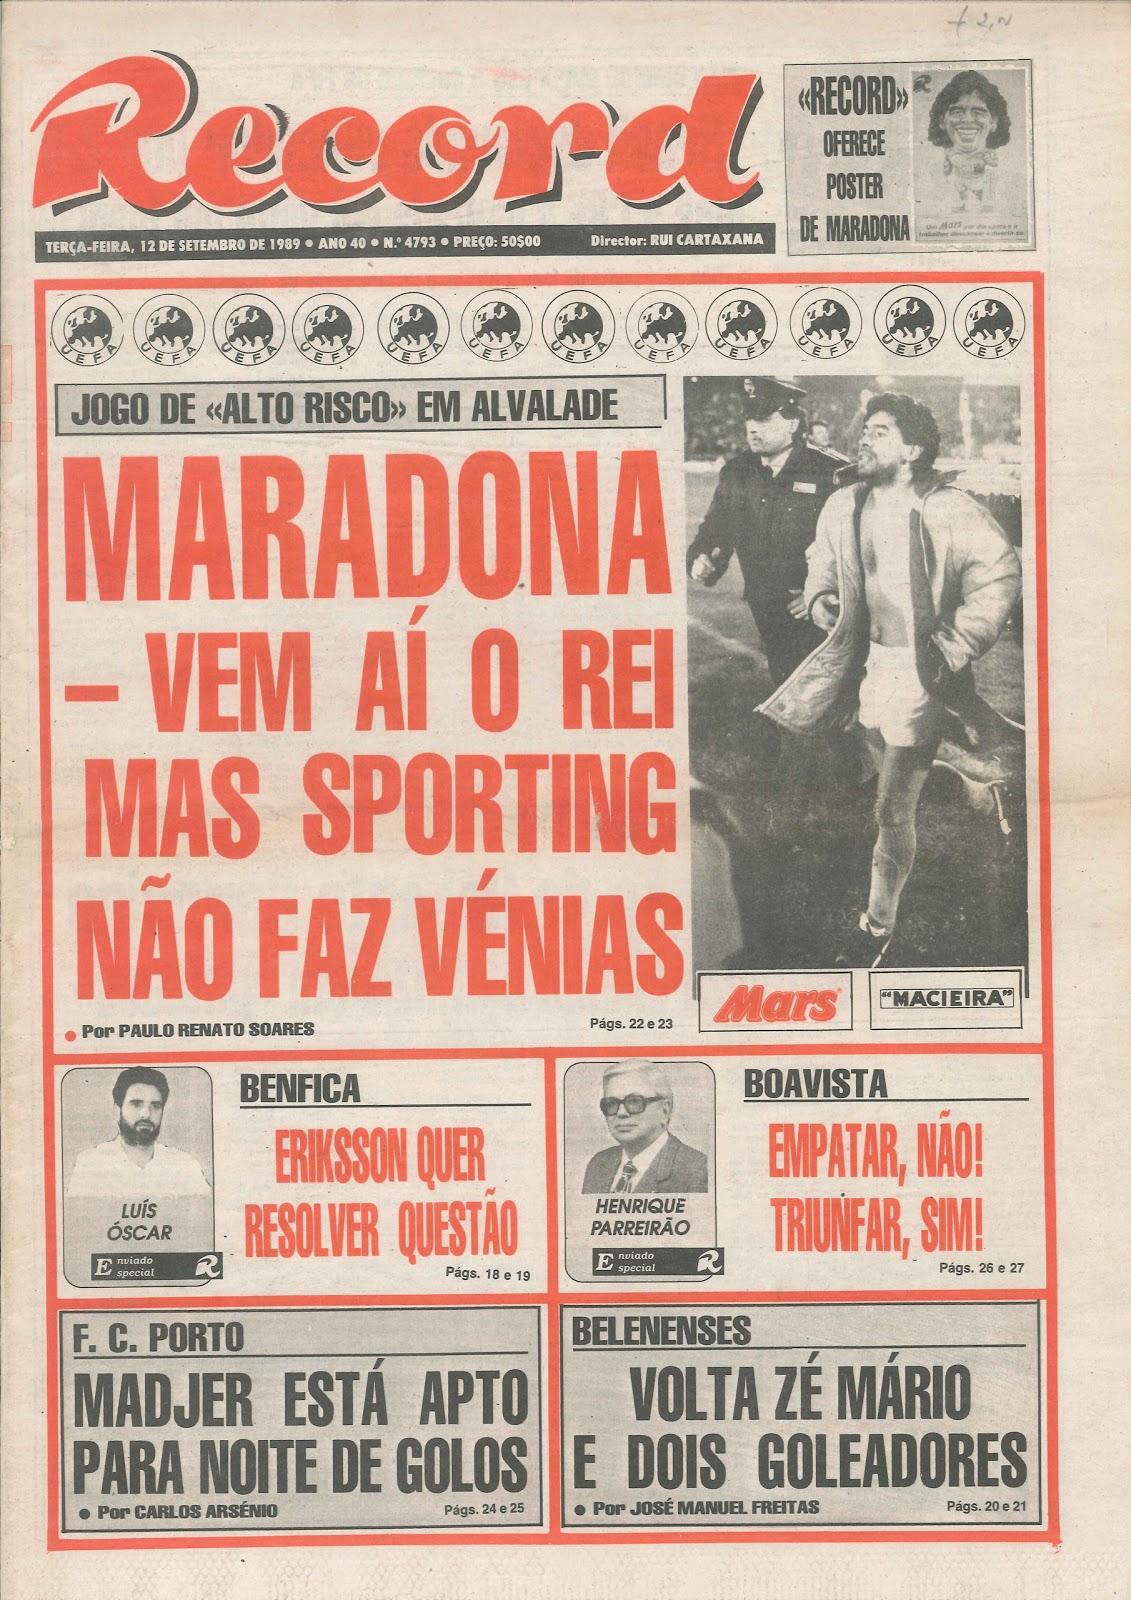 Jornal+Record+-+Armazem+leonino+1.jpg